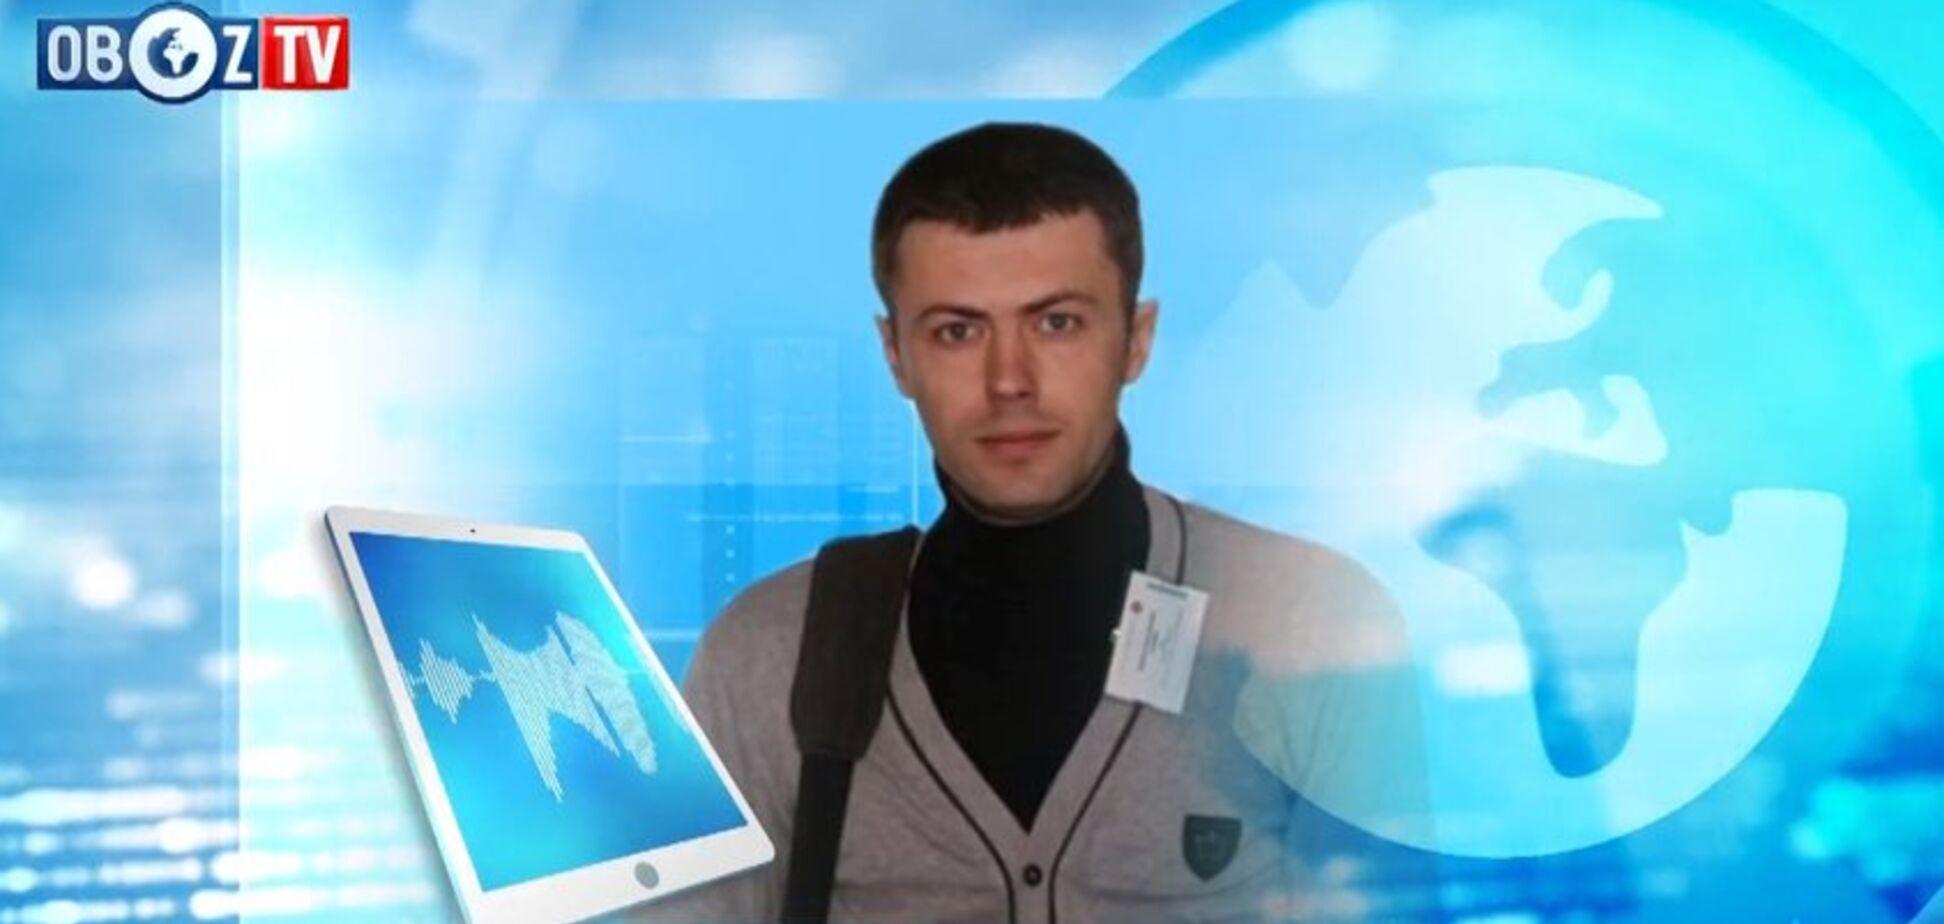 Оккупанты обстреляли КПВВ ''Марьинка'': комментарий эксперта